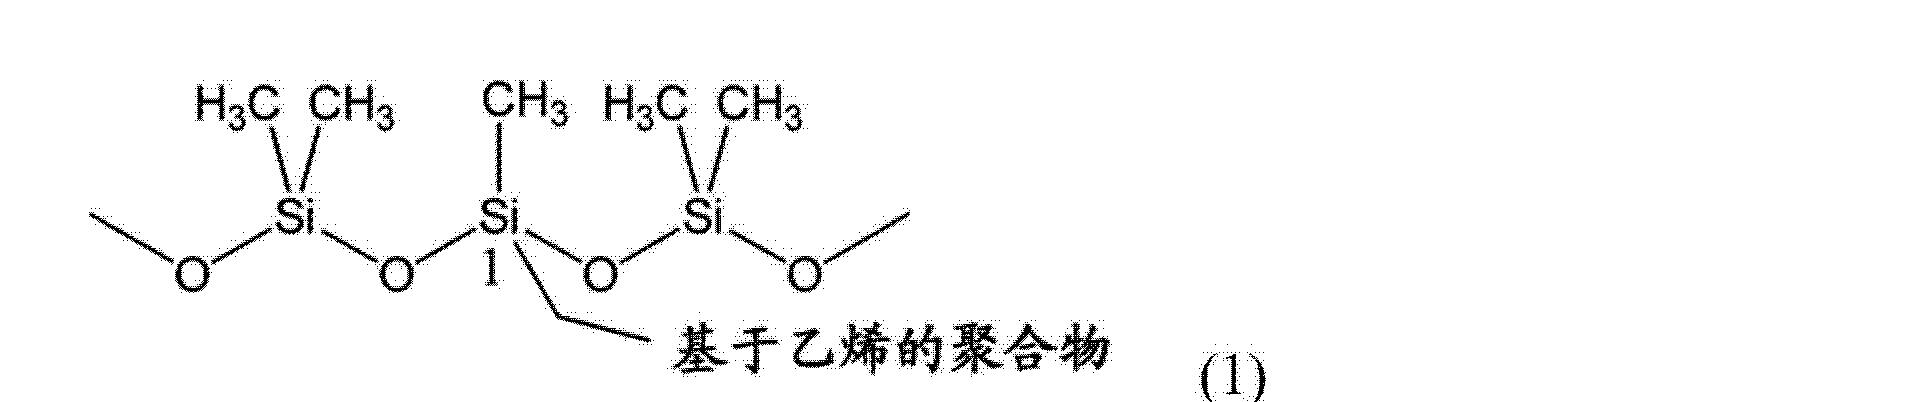 Figure CN102695735AD00041